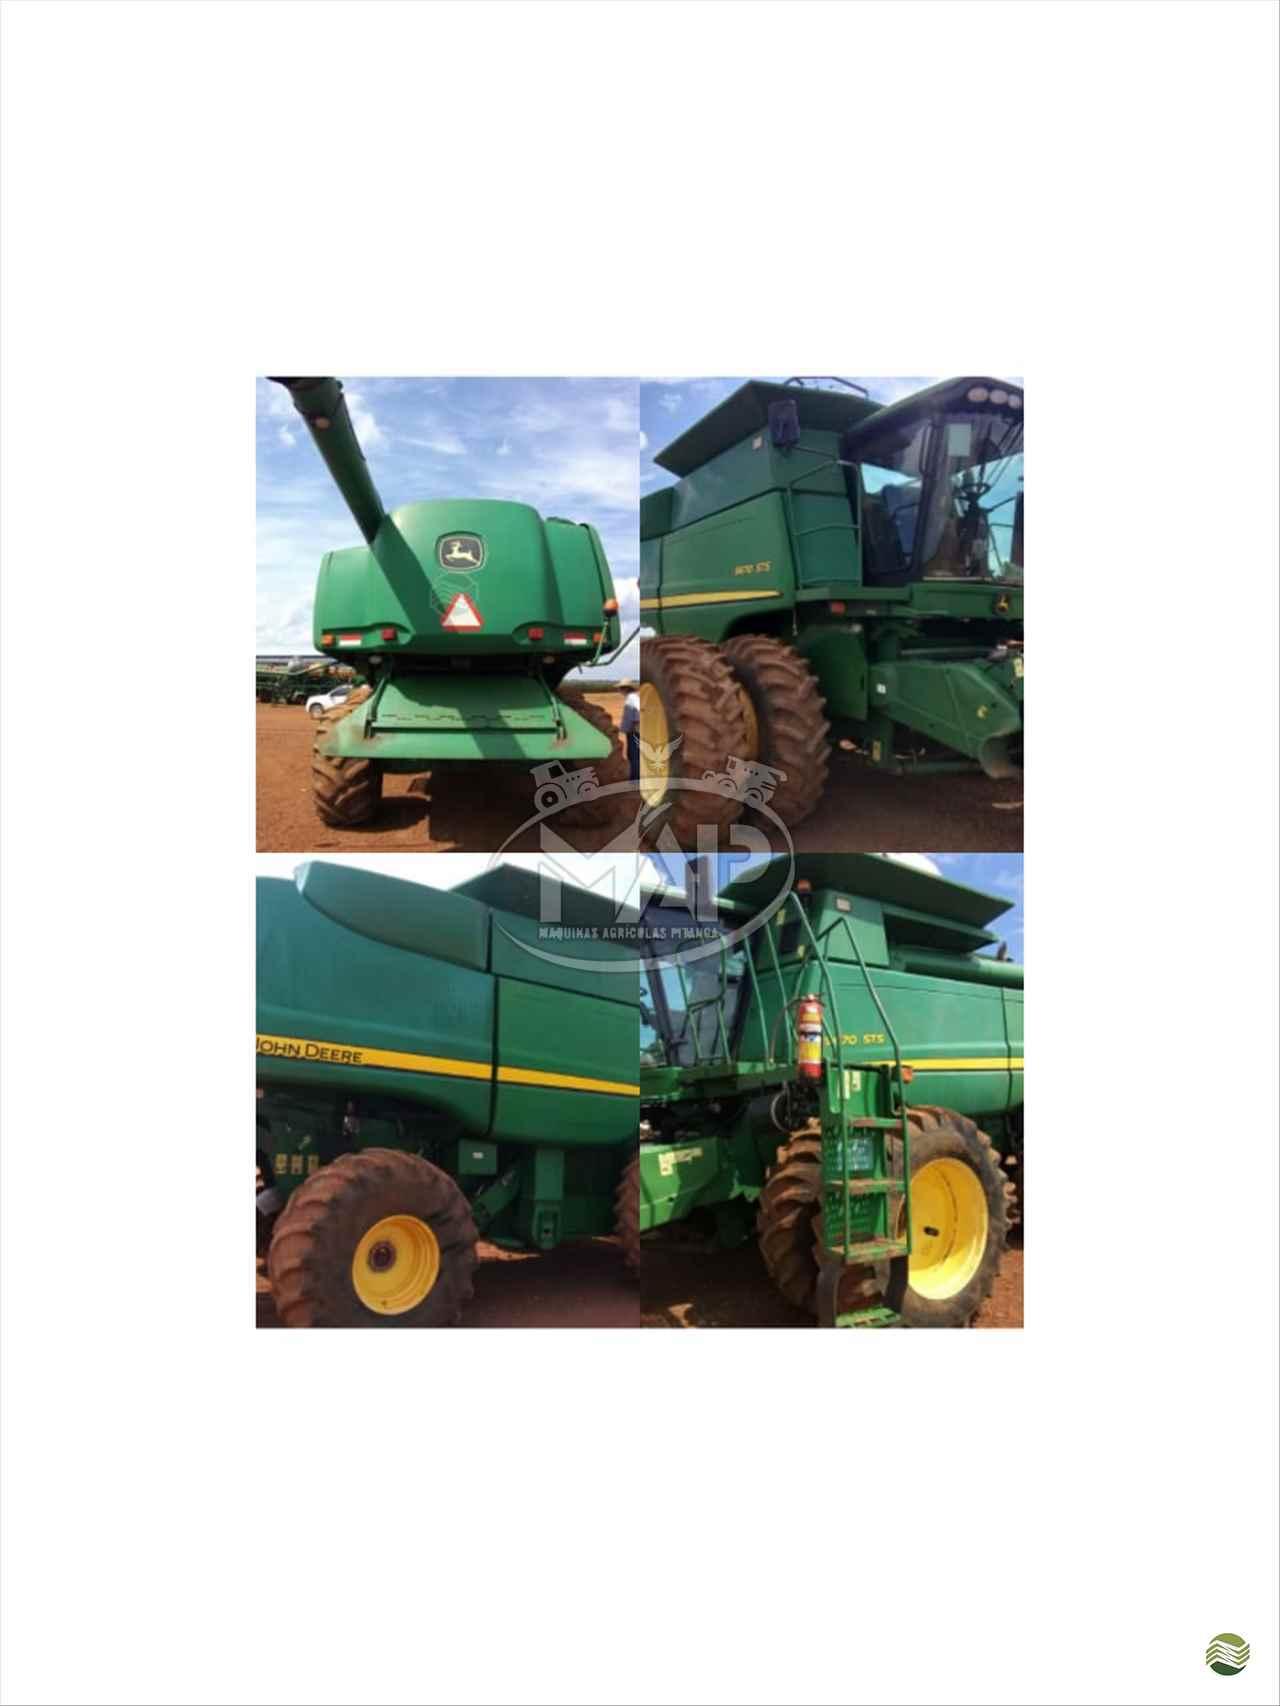 COLHEITADEIRA JOHN DEERE JOHN DEERE 9670 STS Máquinas Agrícolas Pitanga PITANGA PARANÁ PR